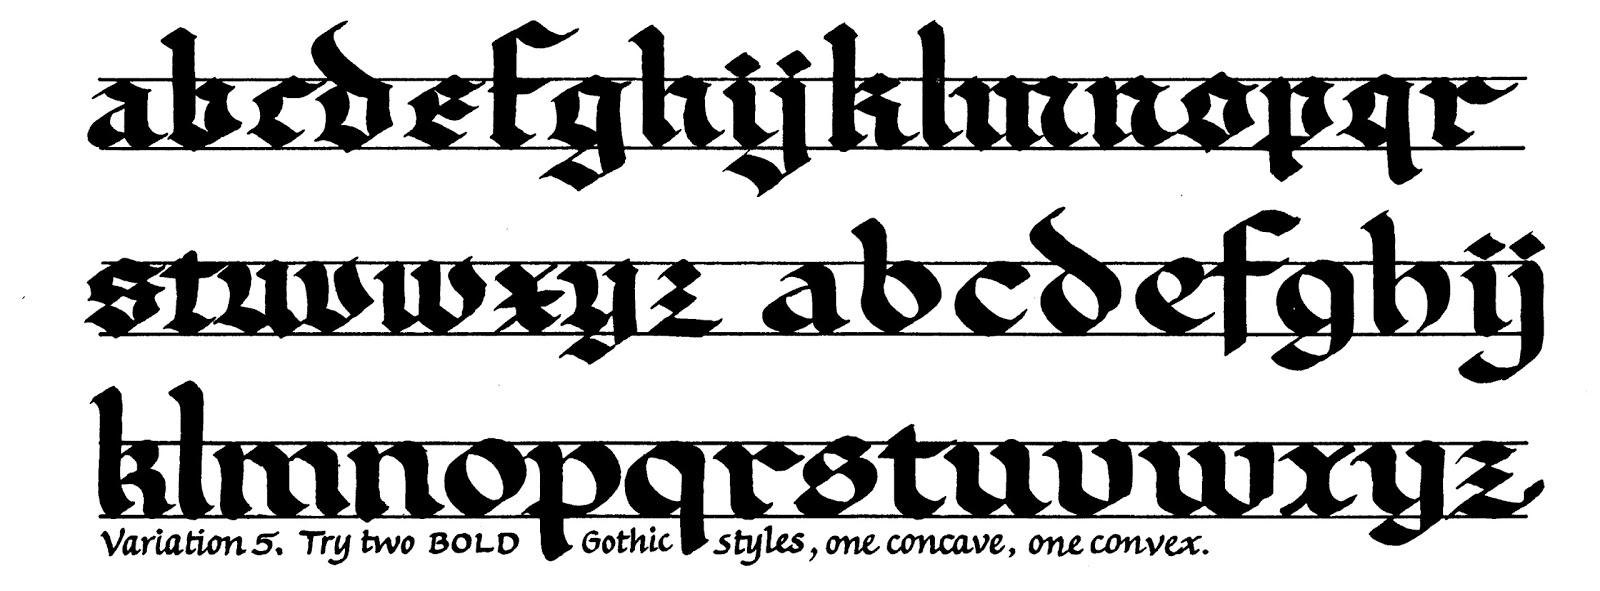 Margaret Shepherd Calligraphy Blog 144 Deflated Short Gothic